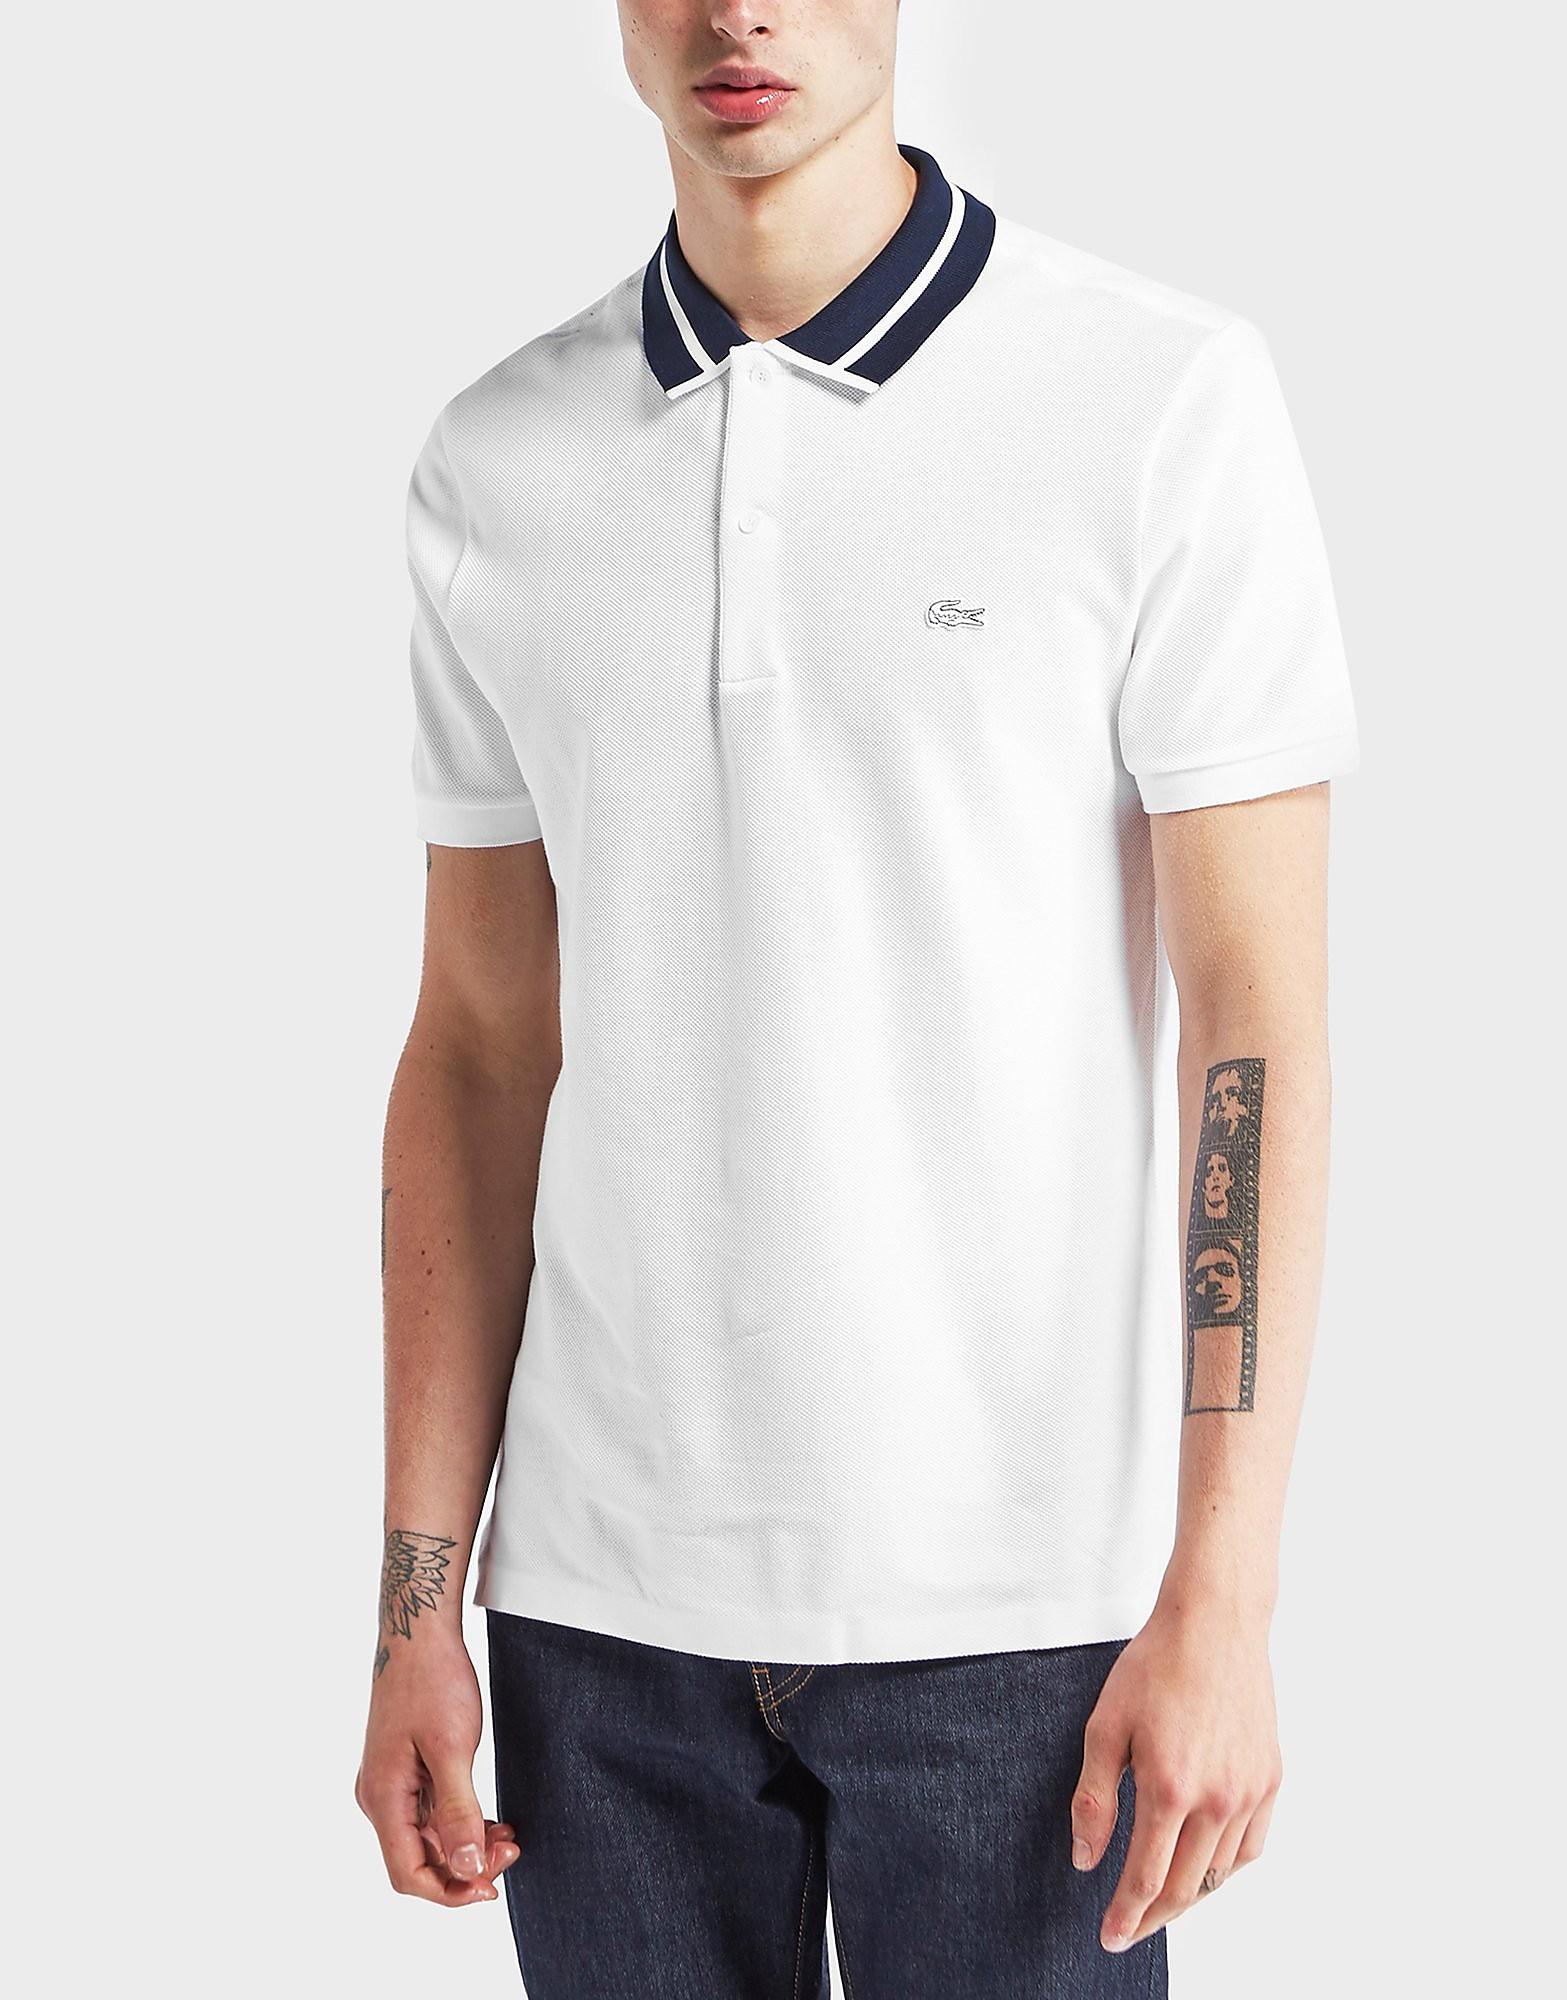 Lacoste Tonal Croc Pique Short Sleeve Polo Shirt